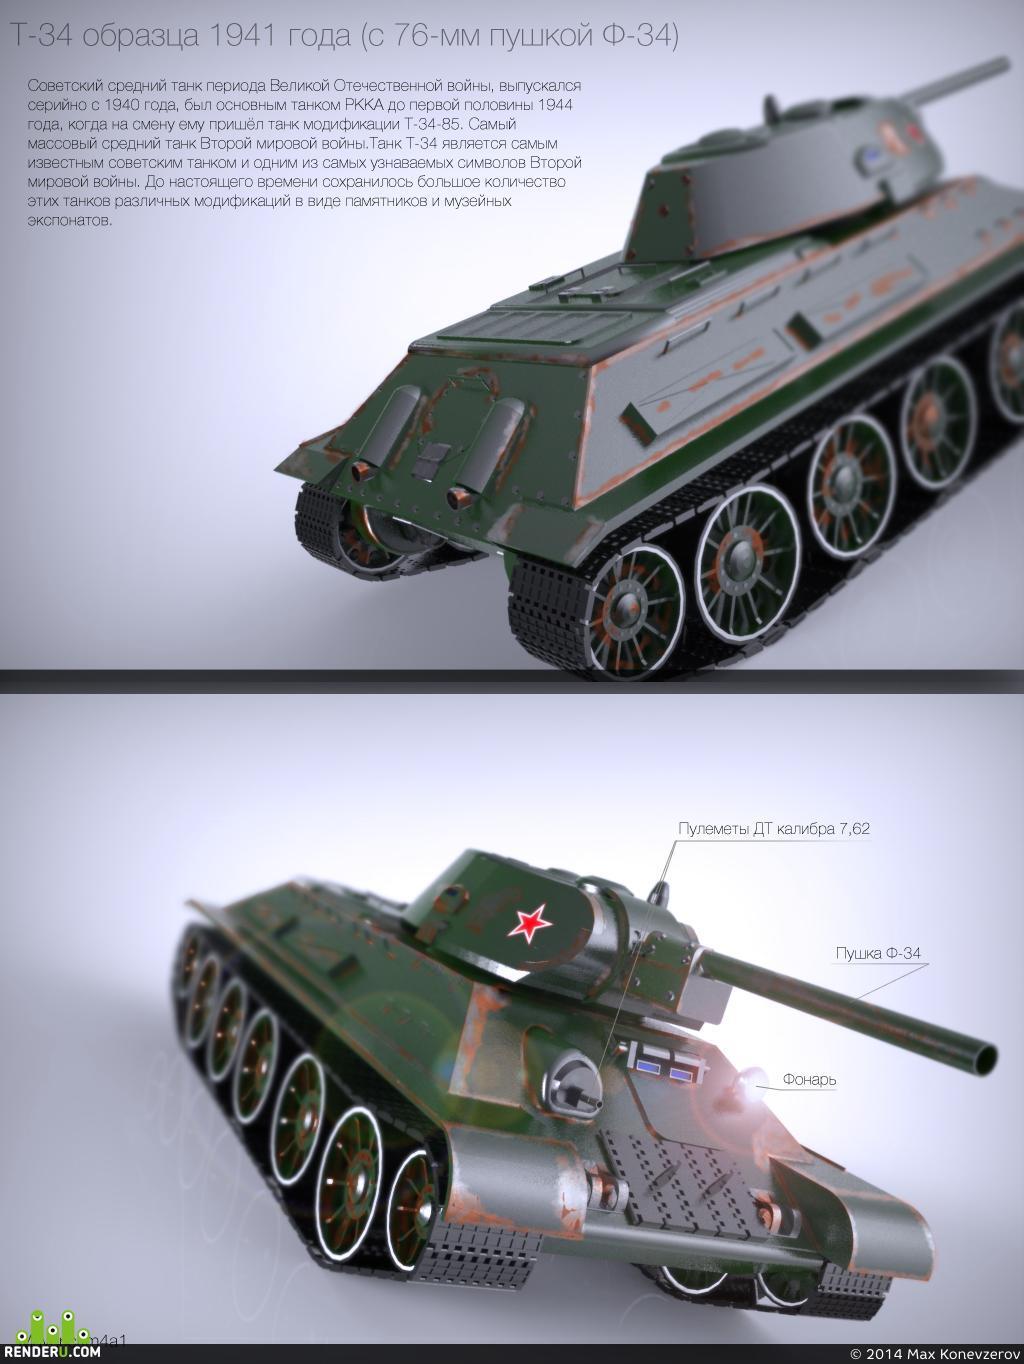 preview Советский средний танк T-34